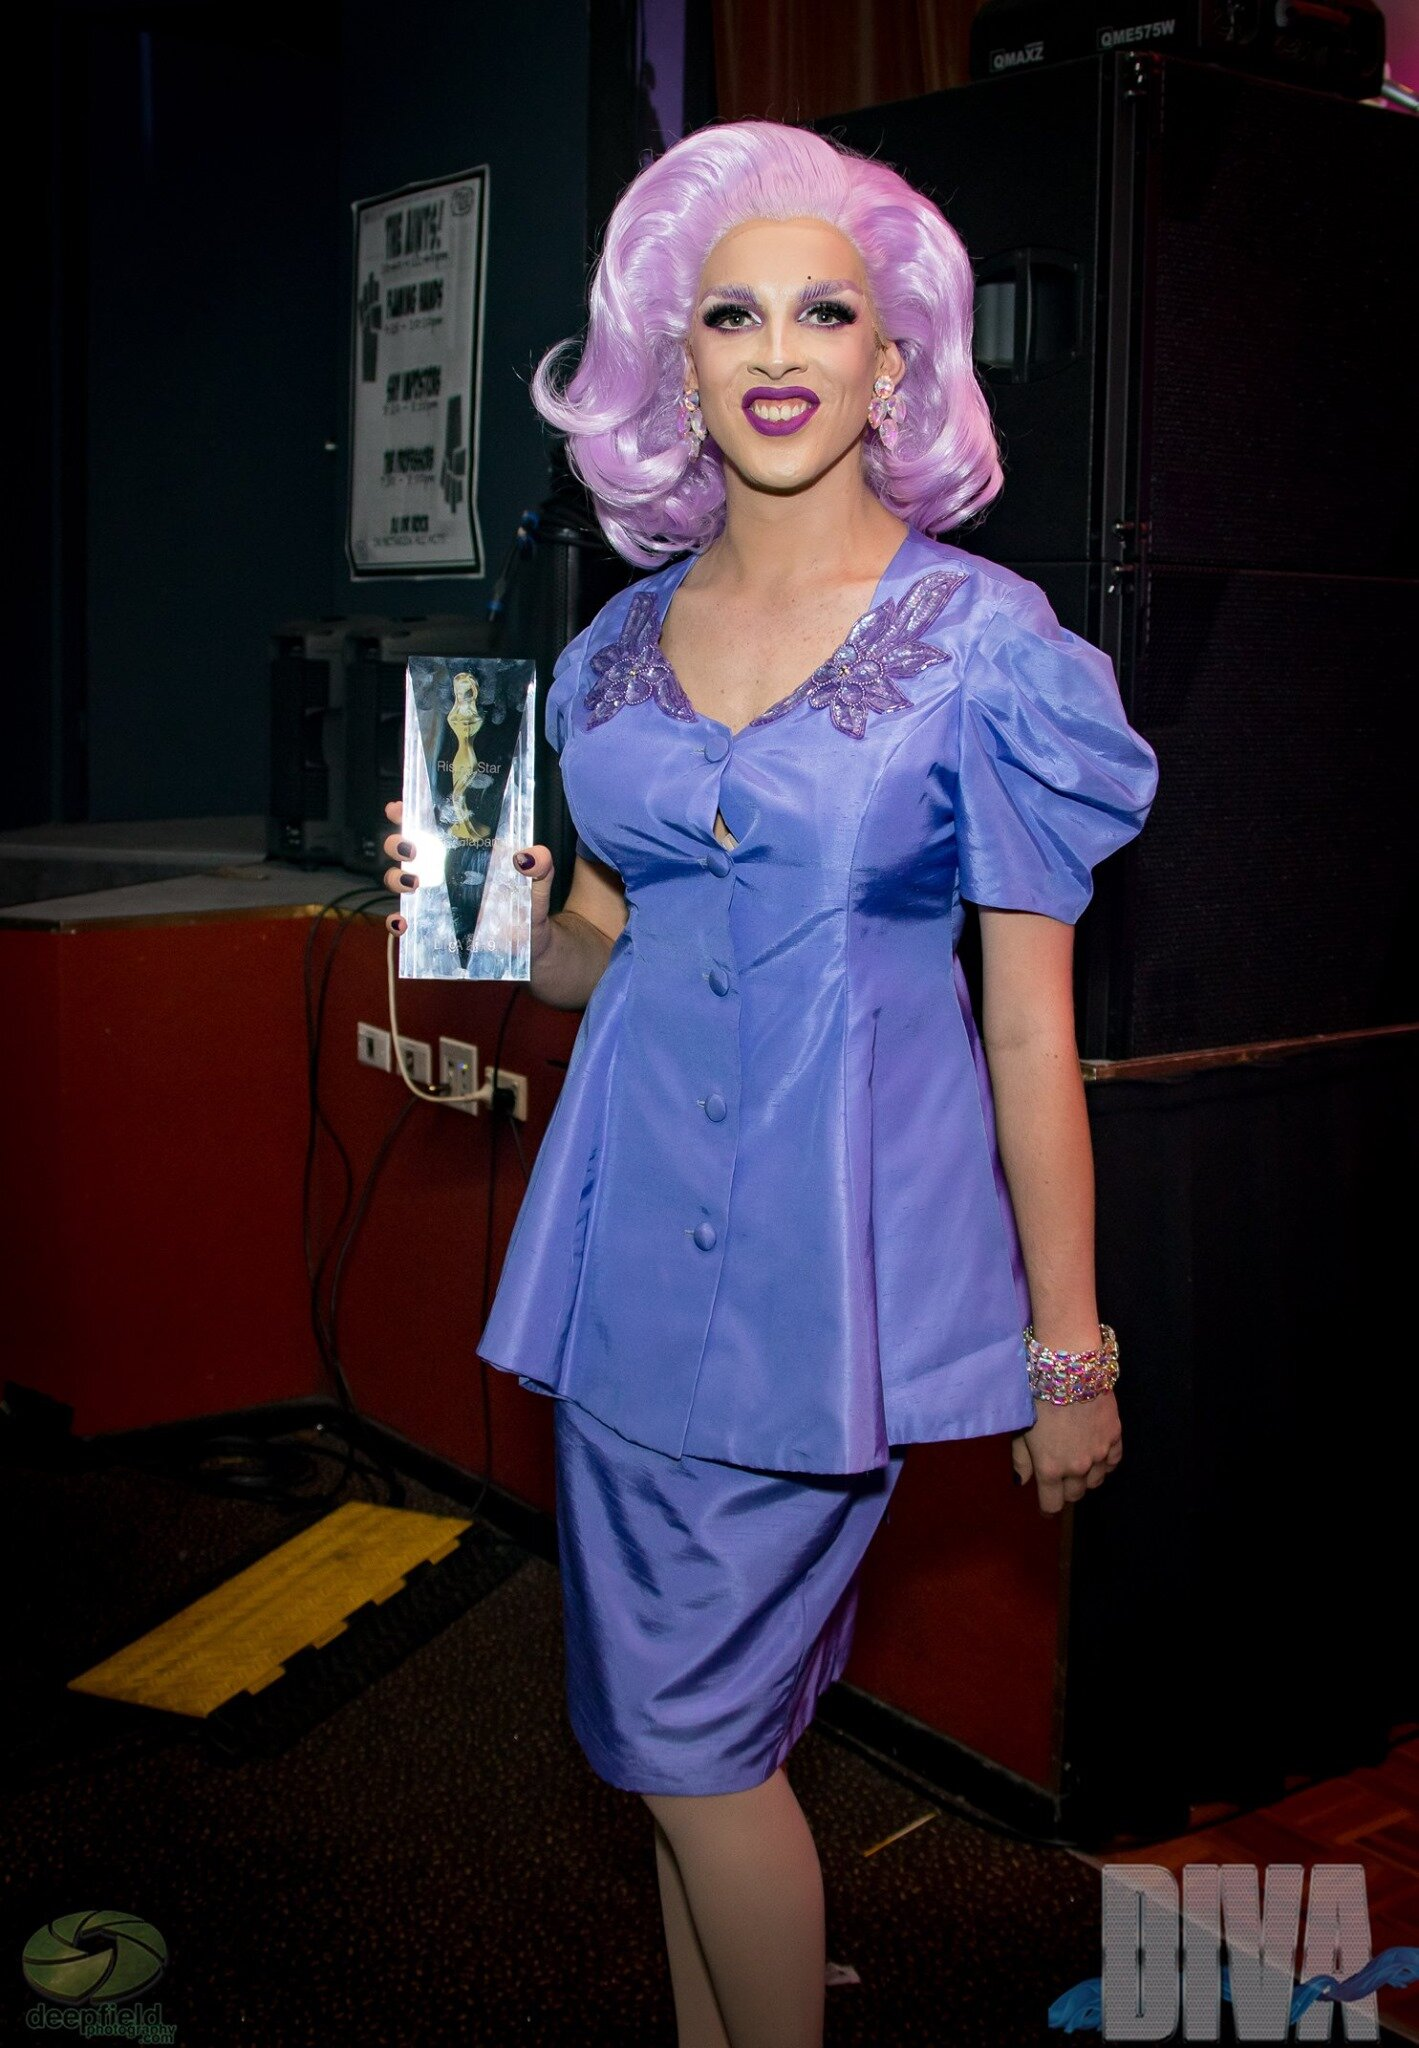 fran-giapanni-rising-star-diva-awards-sydney-drag-queen-royalty-best-hire-drag-race-australia-2.jpg